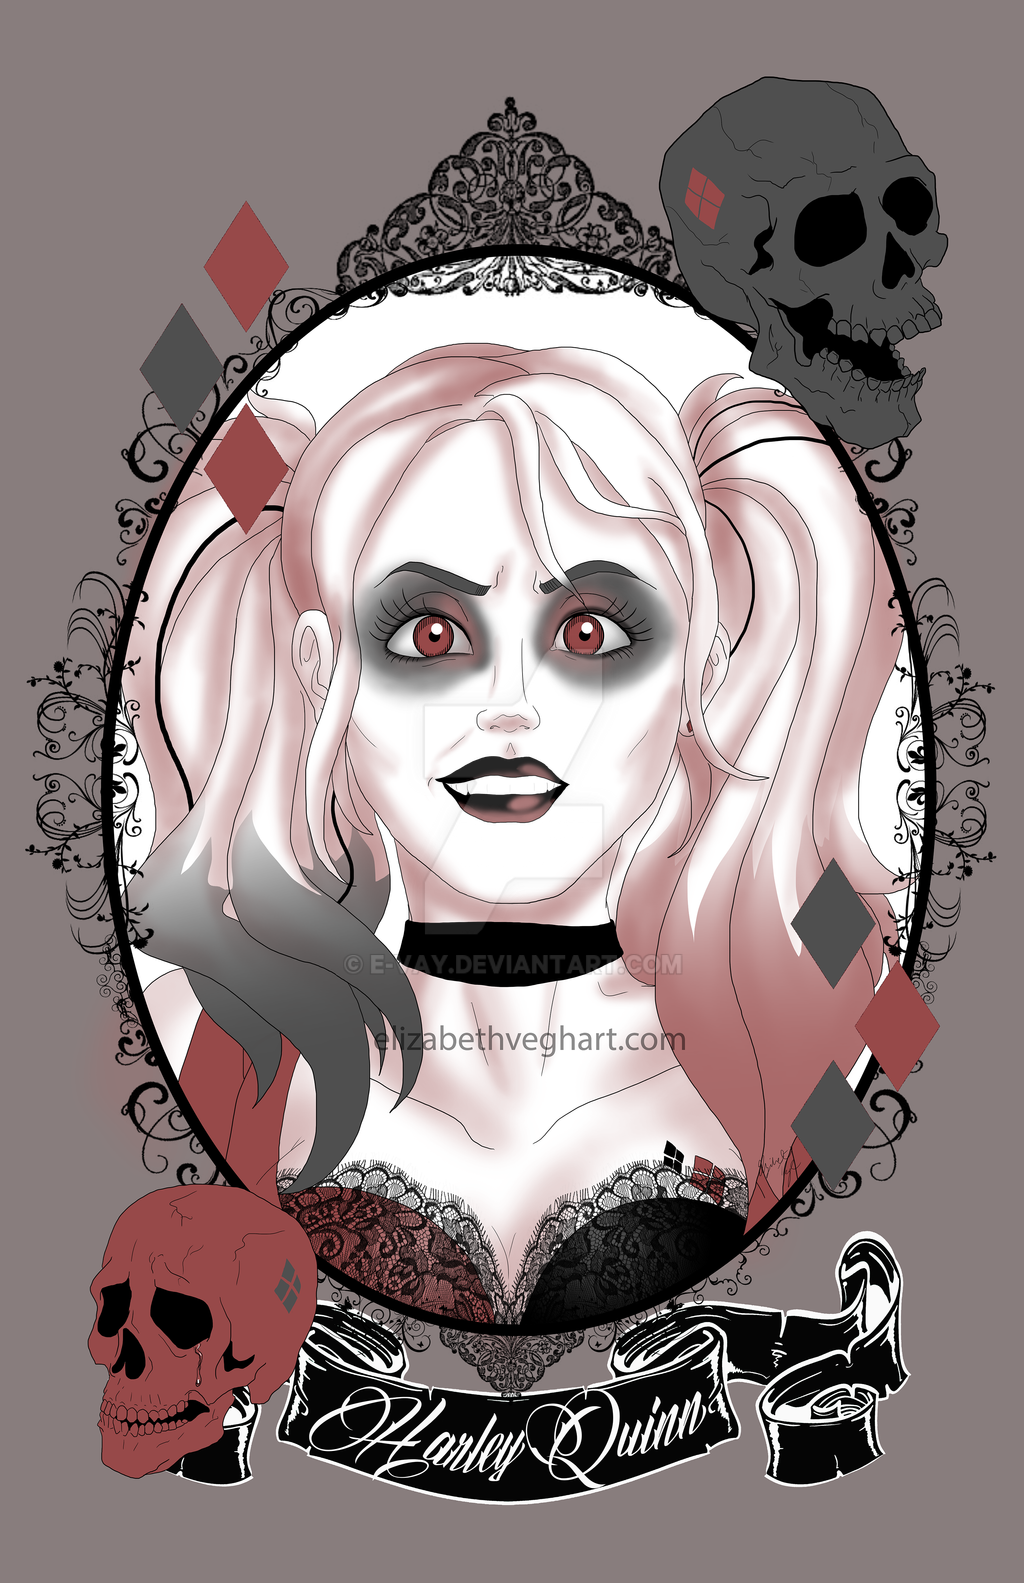 DC Gals: Harley Quinn by E-vay